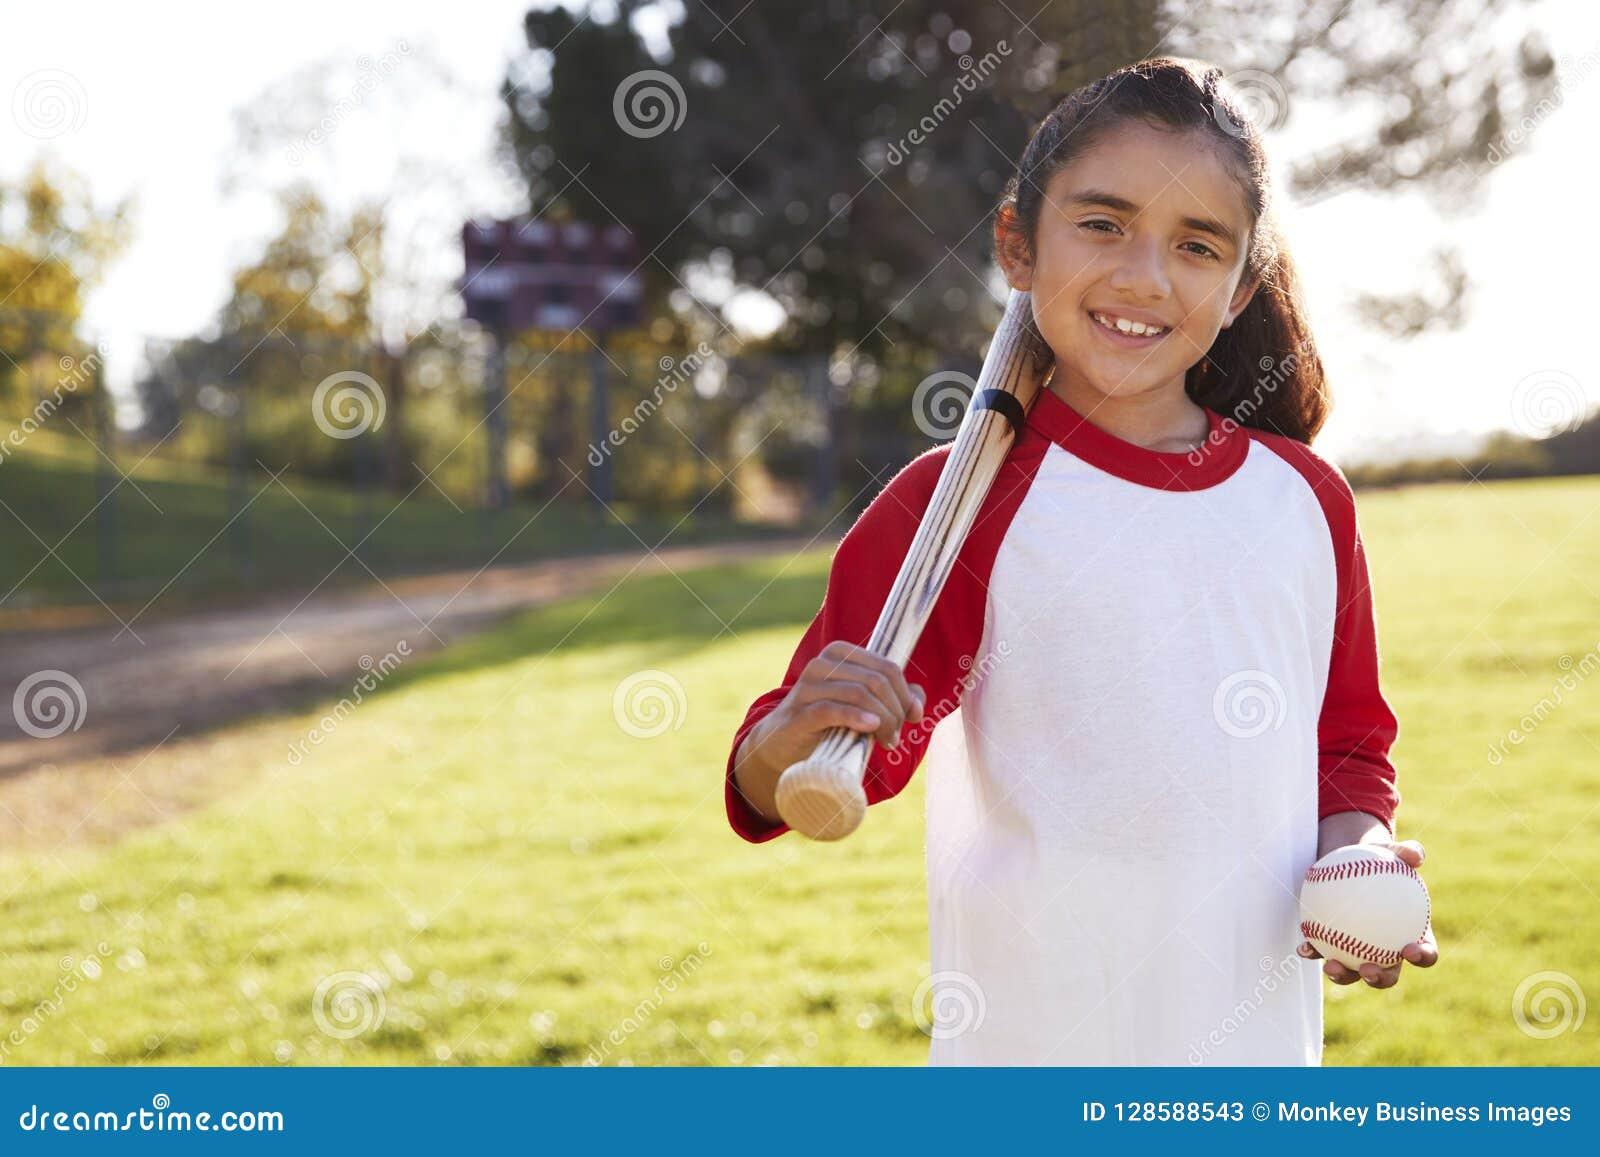 Young Hispanic girl with baseball and bat smiling to camera